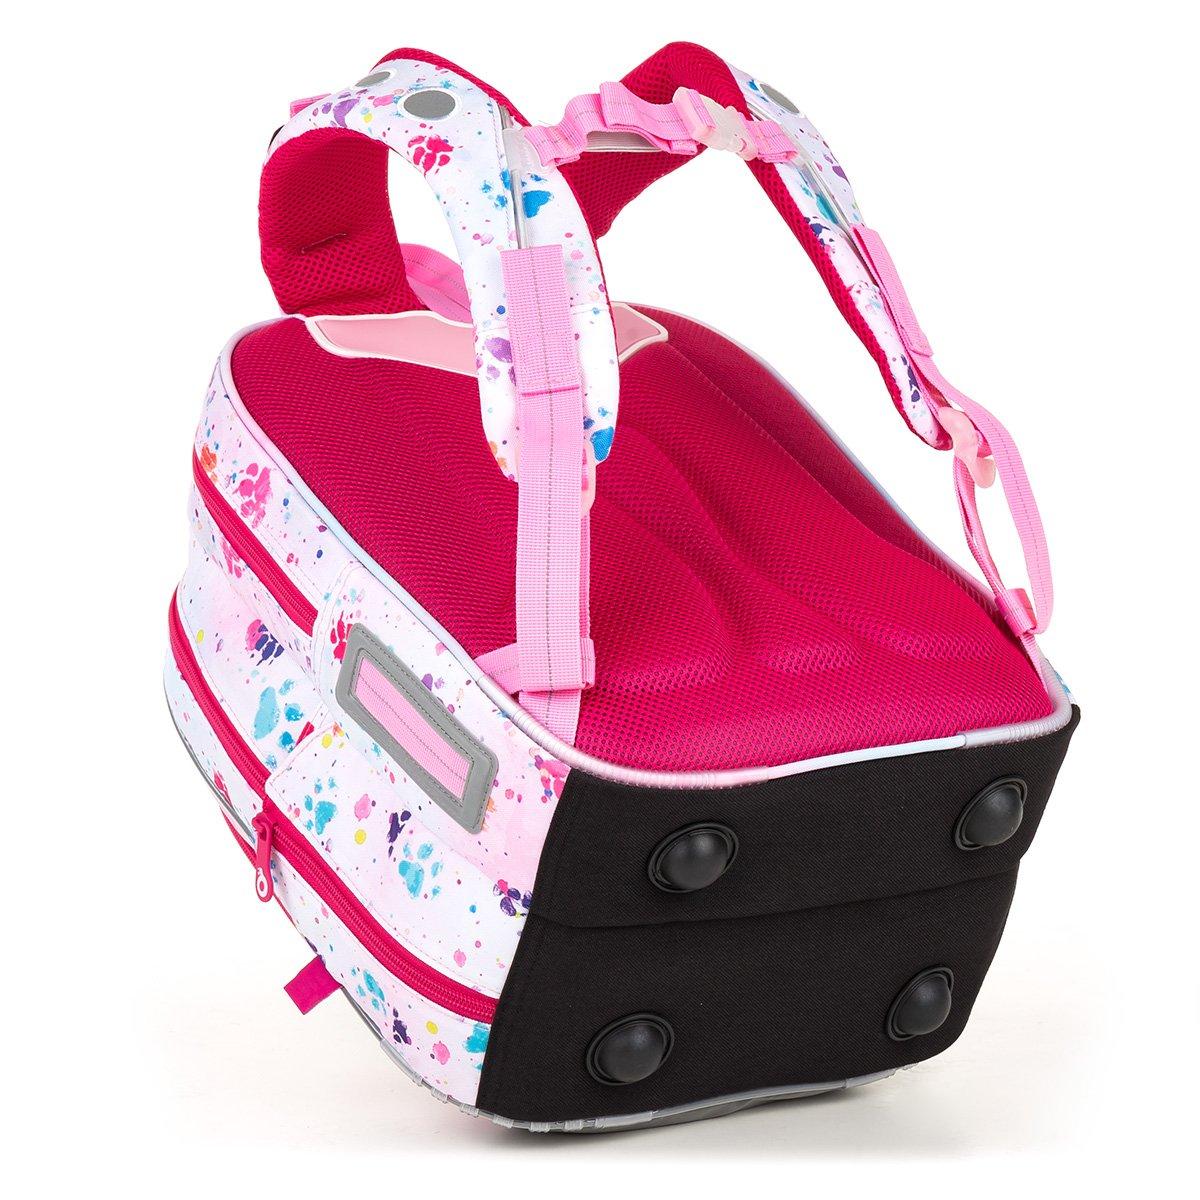 Školní batoh Topgal ENDY 18017 G  c7e98f120e